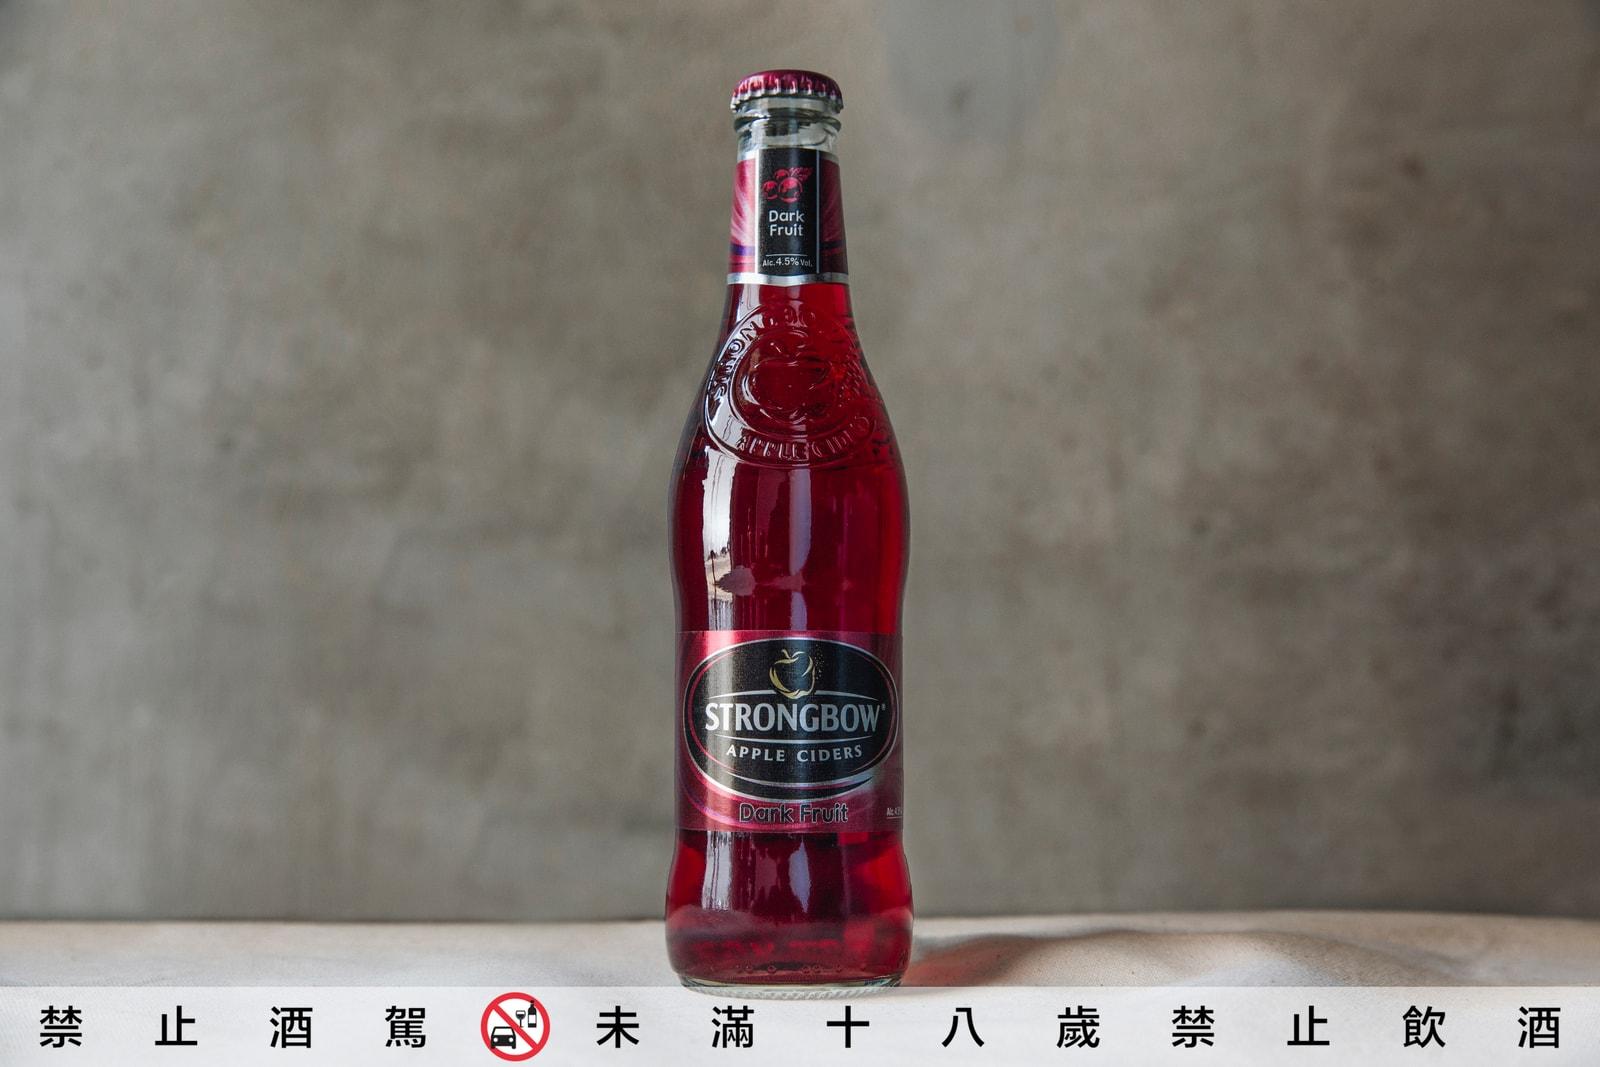 #HBPlaylist - Julia Wu & 阮禾茜推薦「次世代黑甜歌單」